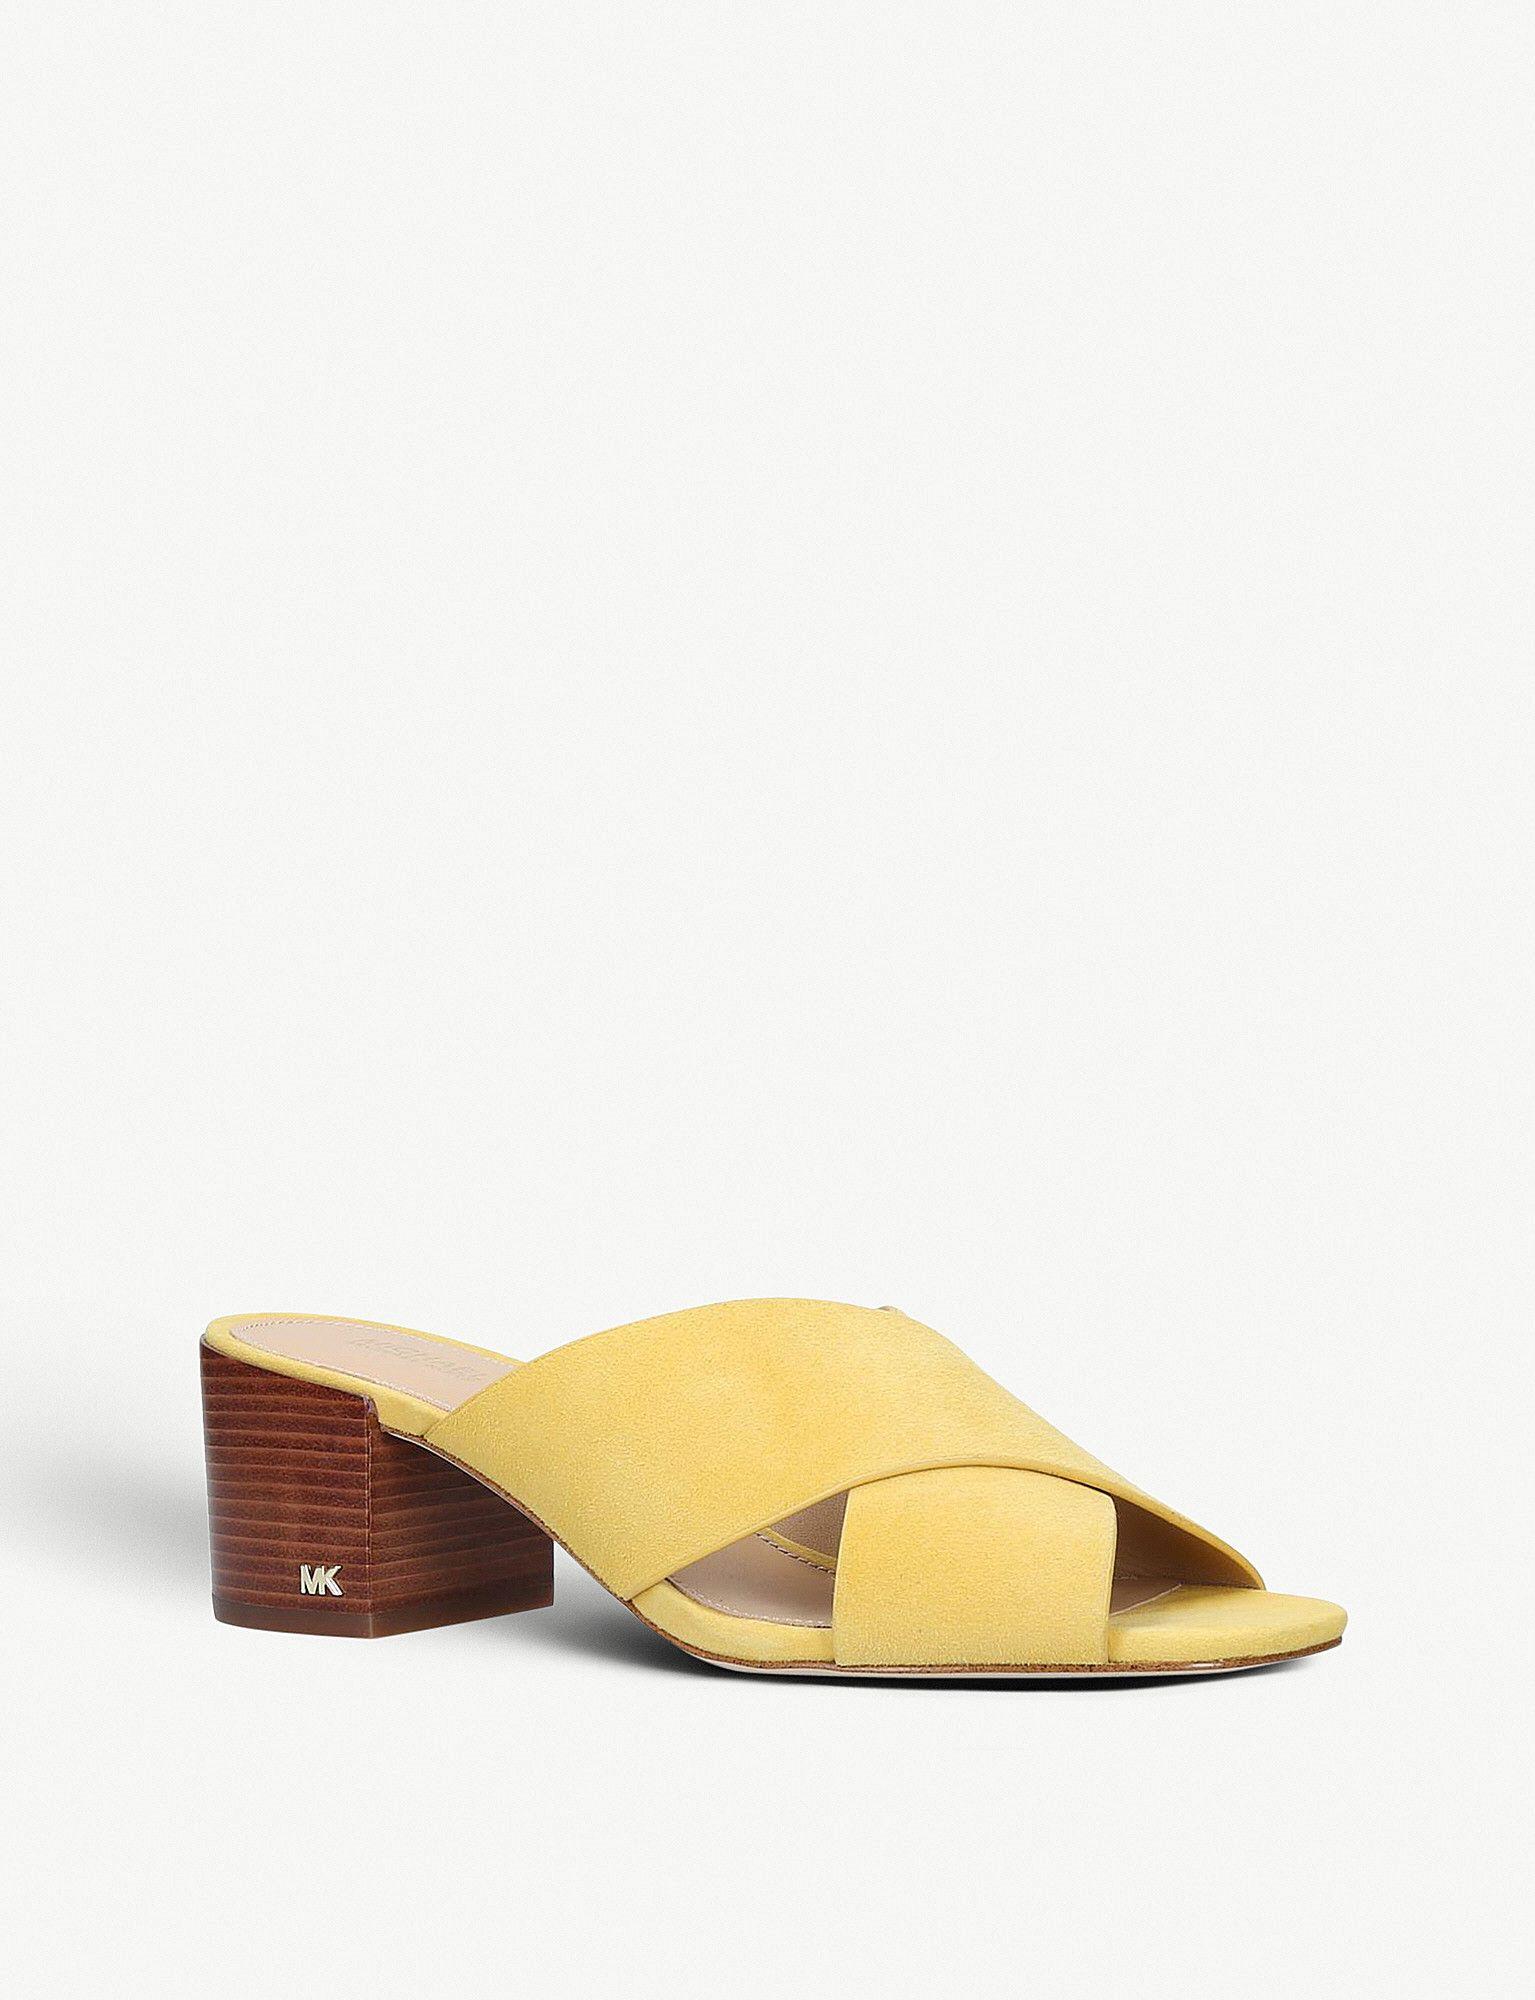 70899aba95e MICHAEL MICHAEL KORS - Abbott leather mules | Selfridges.com | All ...